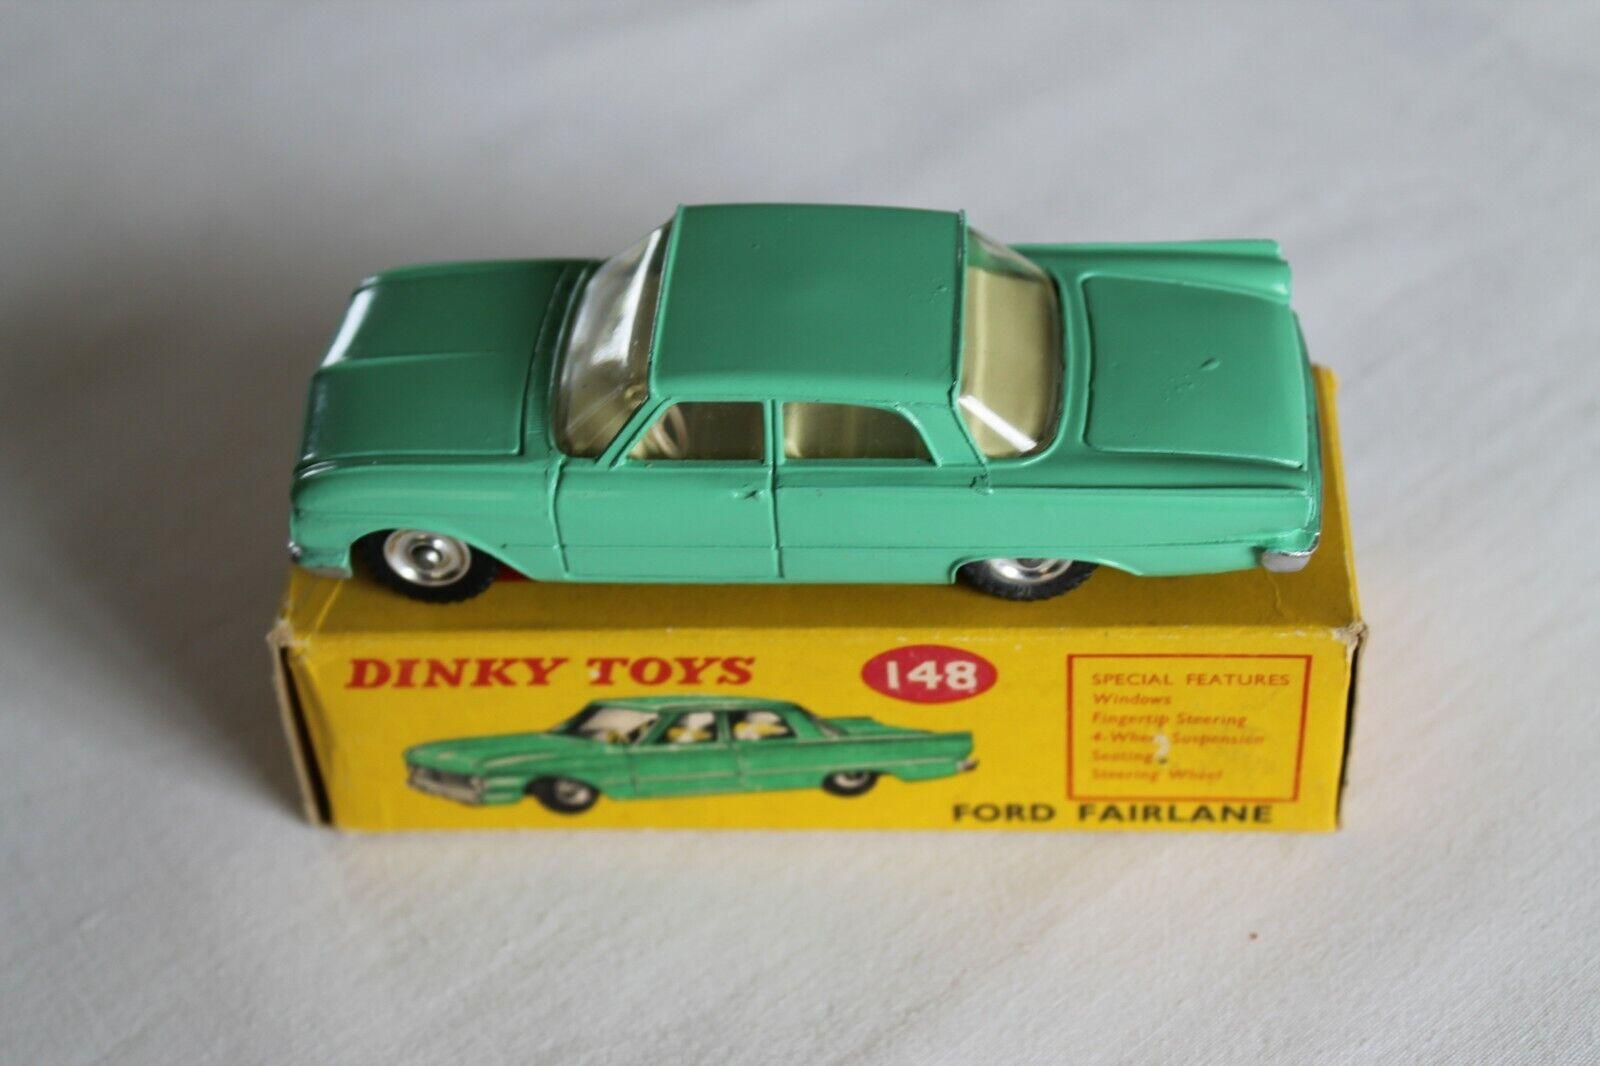 comprar mejor Dinky Juguetes Juguetes Juguetes 148 Ford Fairlane Pea verde-Limón Interior  venta directa de fábrica